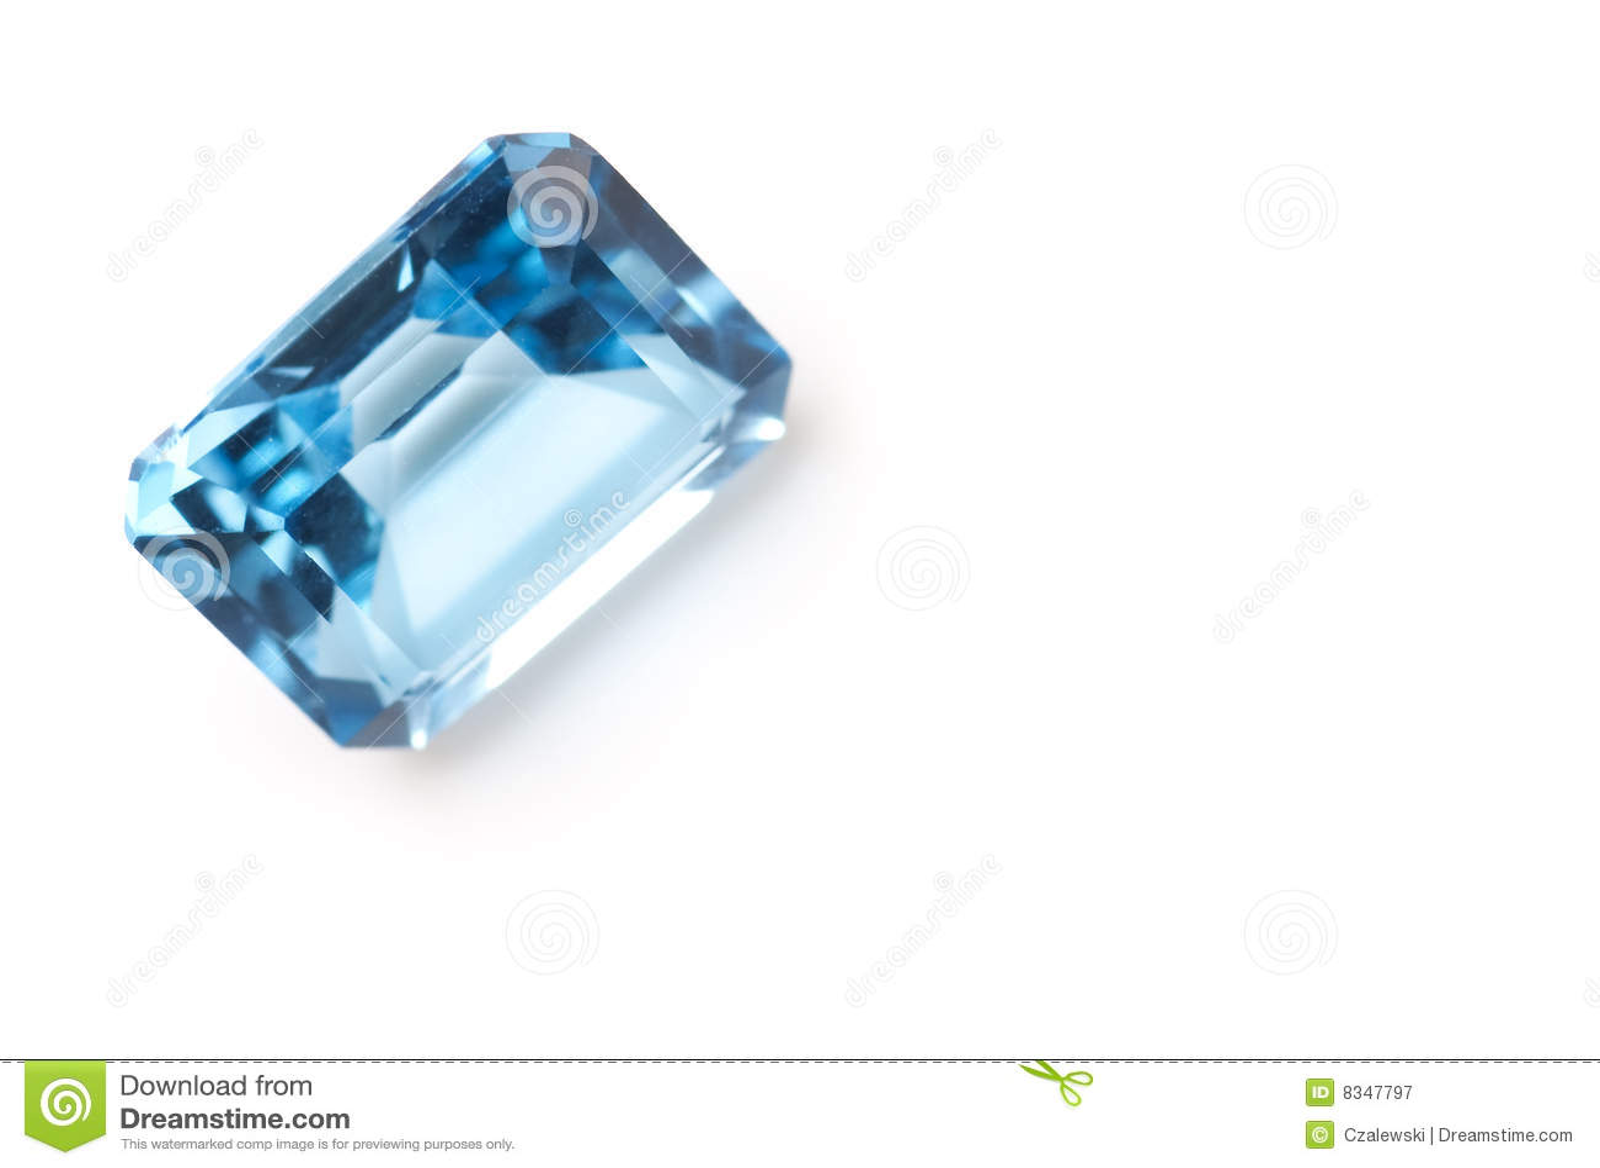 Light blue saphire isolated on white background